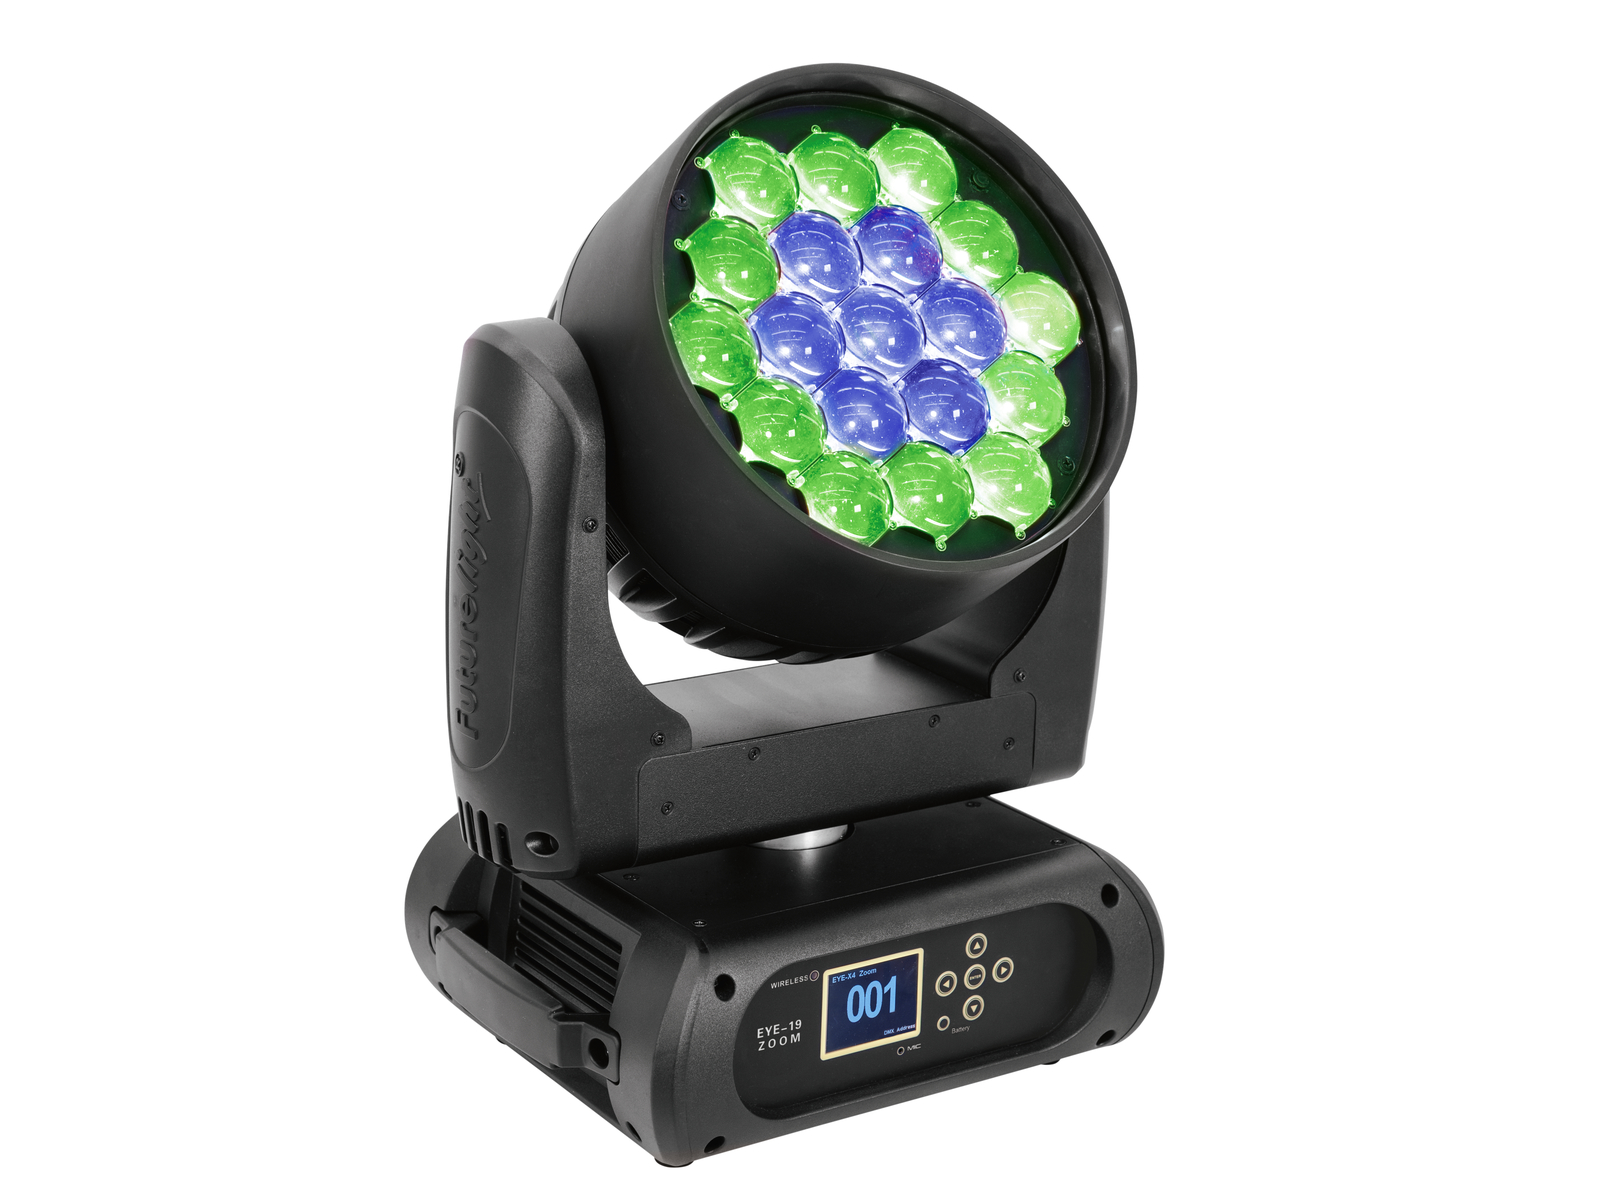 futurelight-eye-19-hcl-zoom-led-moving-head-wash